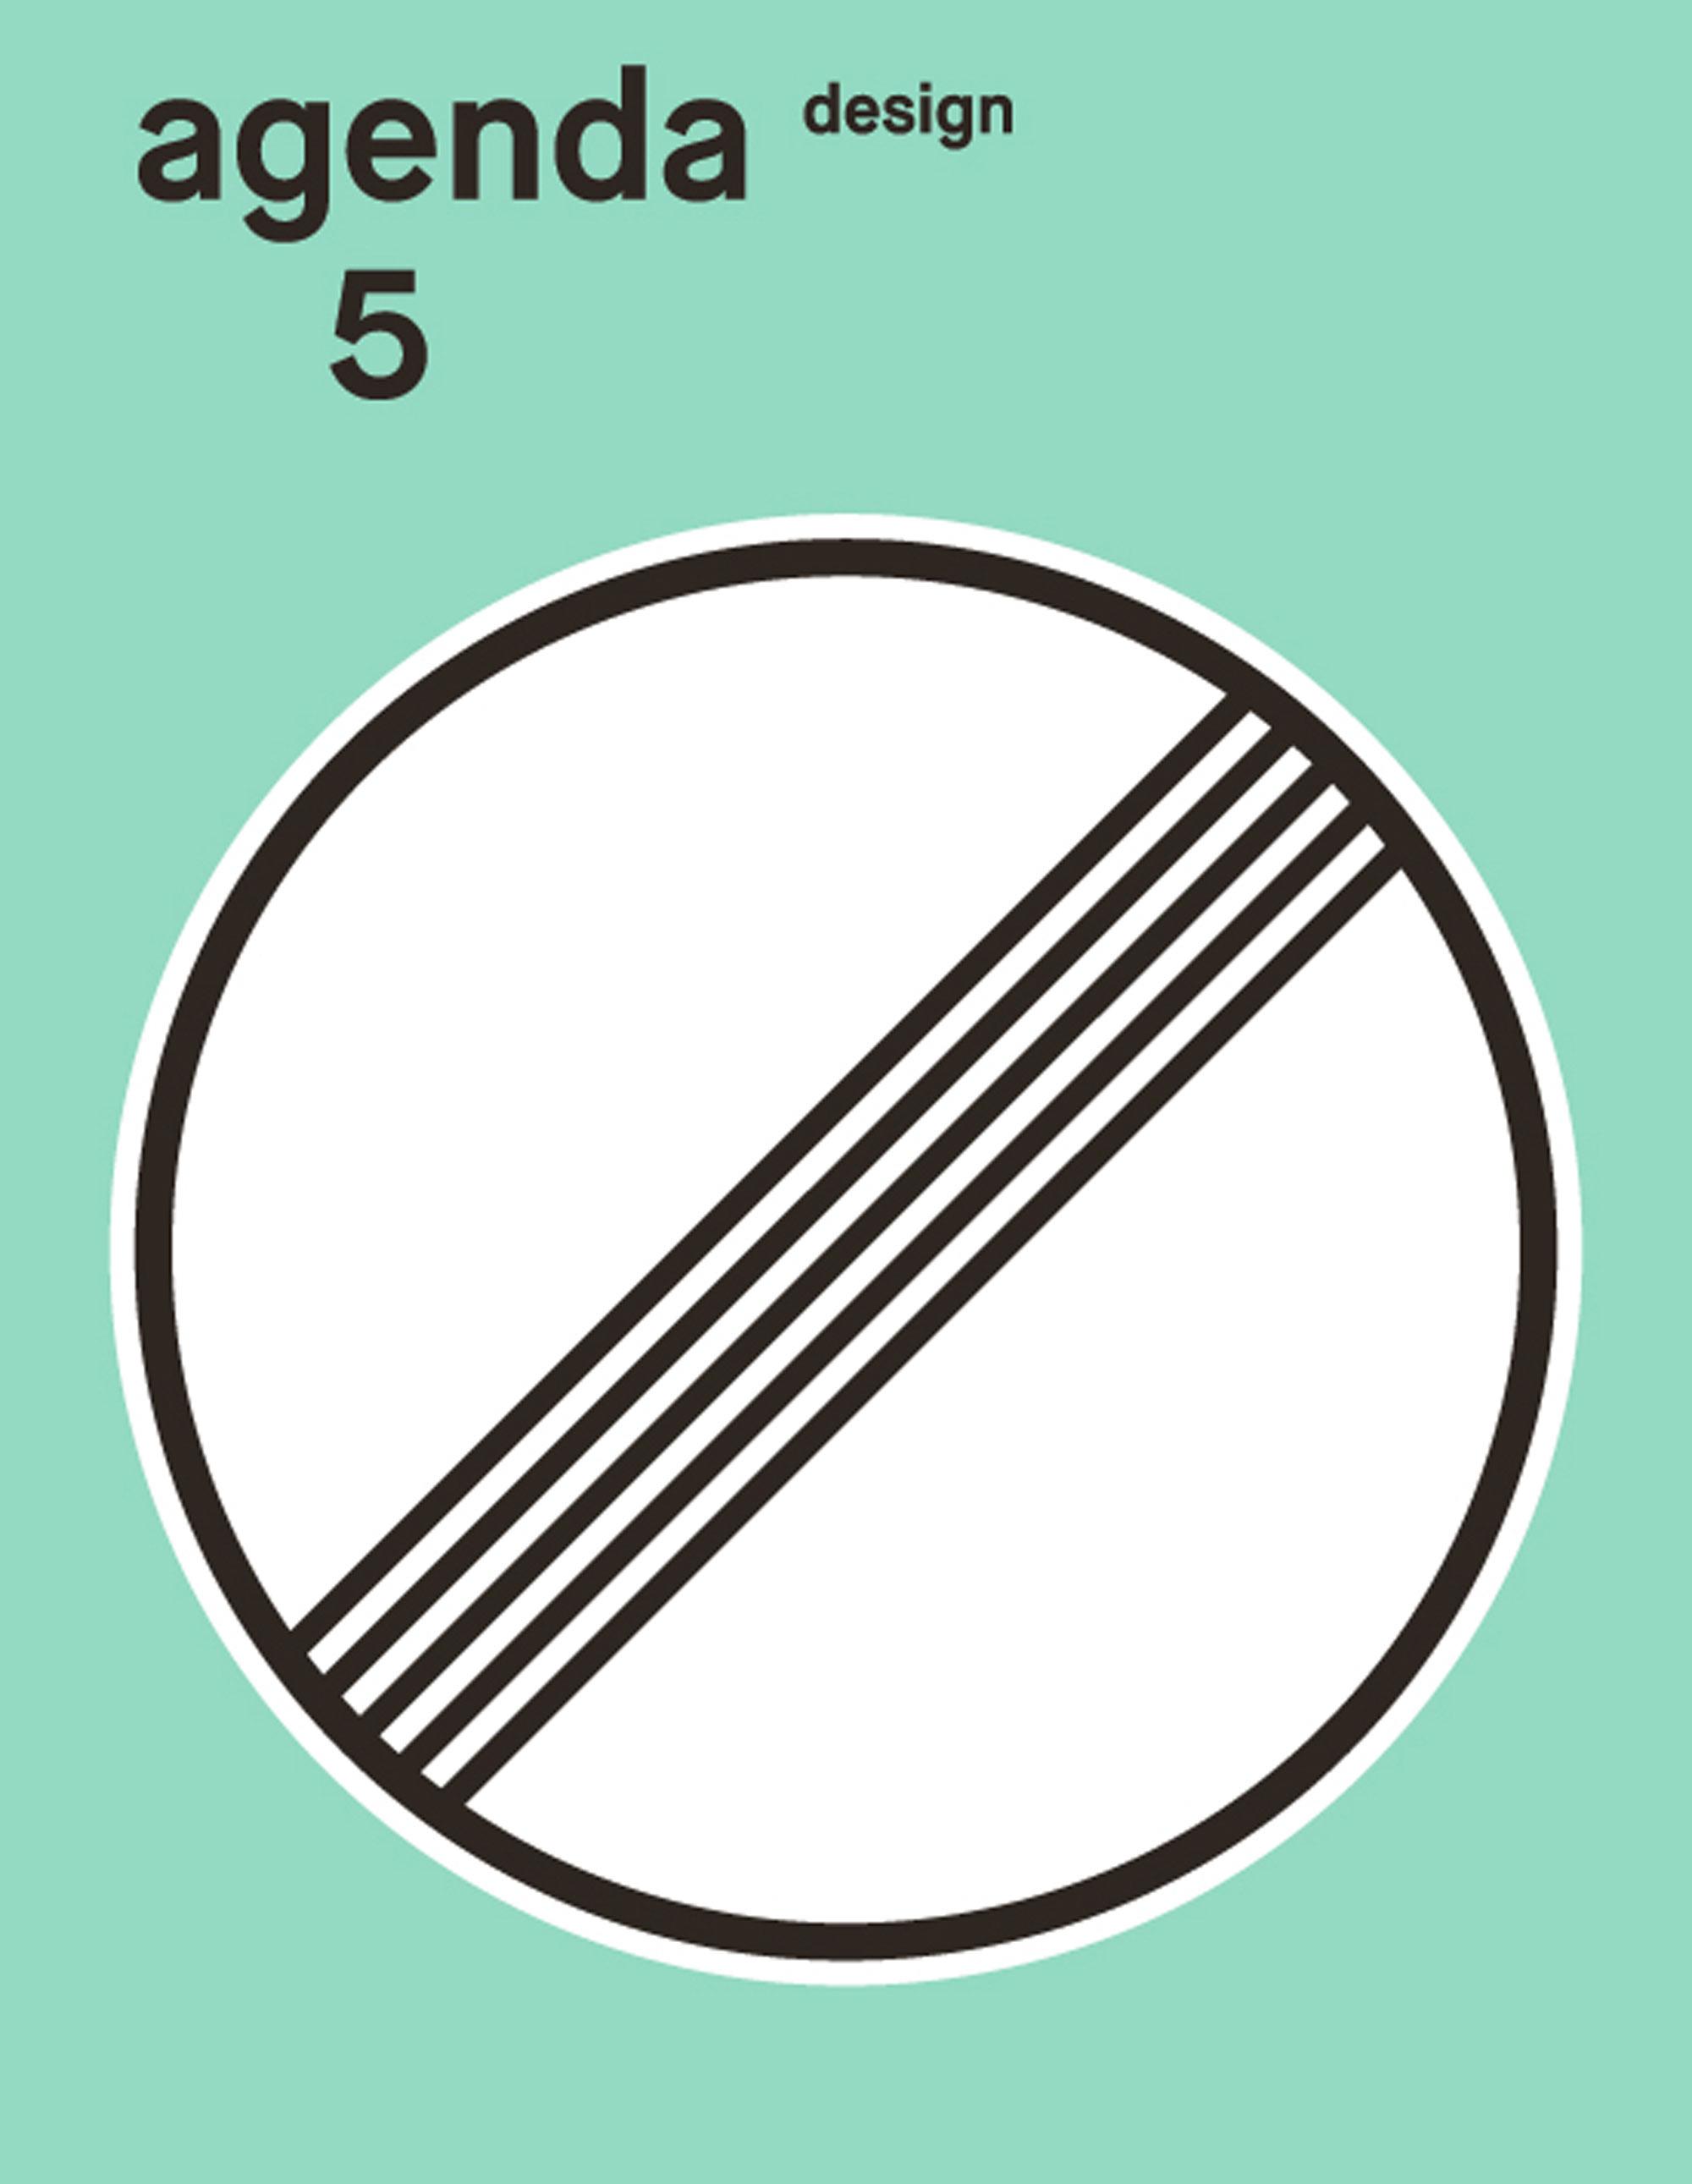 agenda design 5 cover